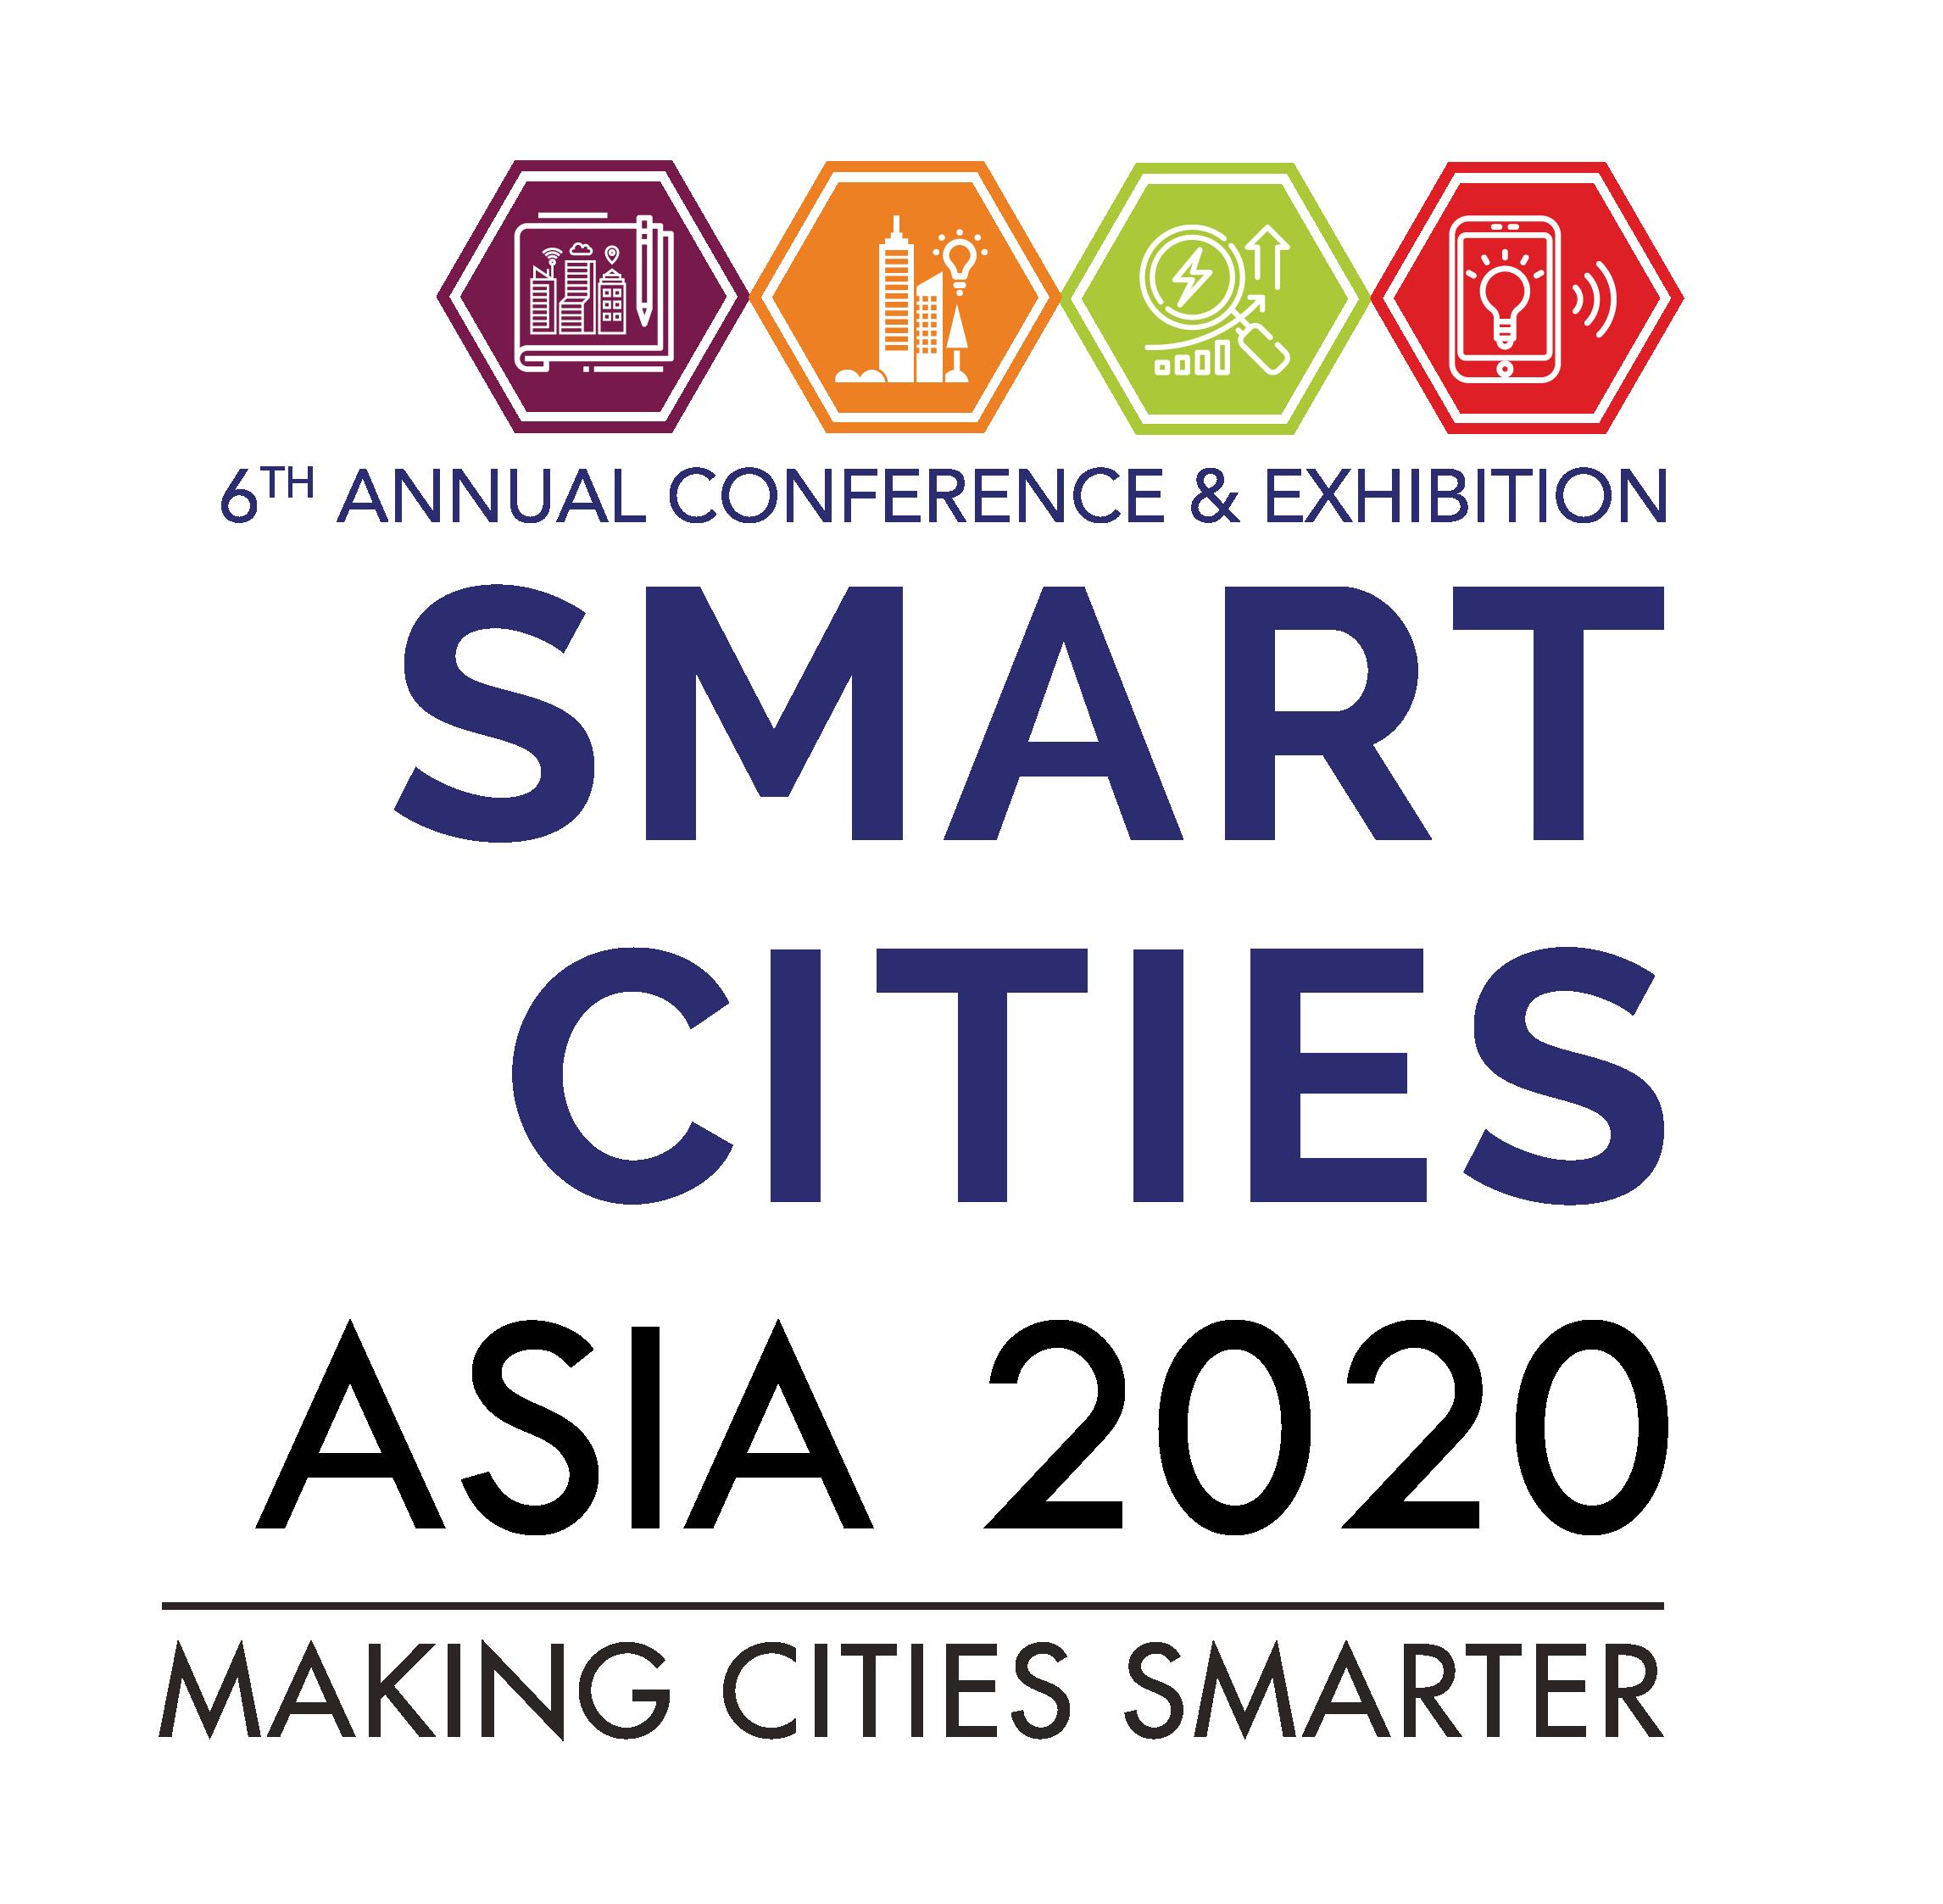 Smart Cities Asia 2020